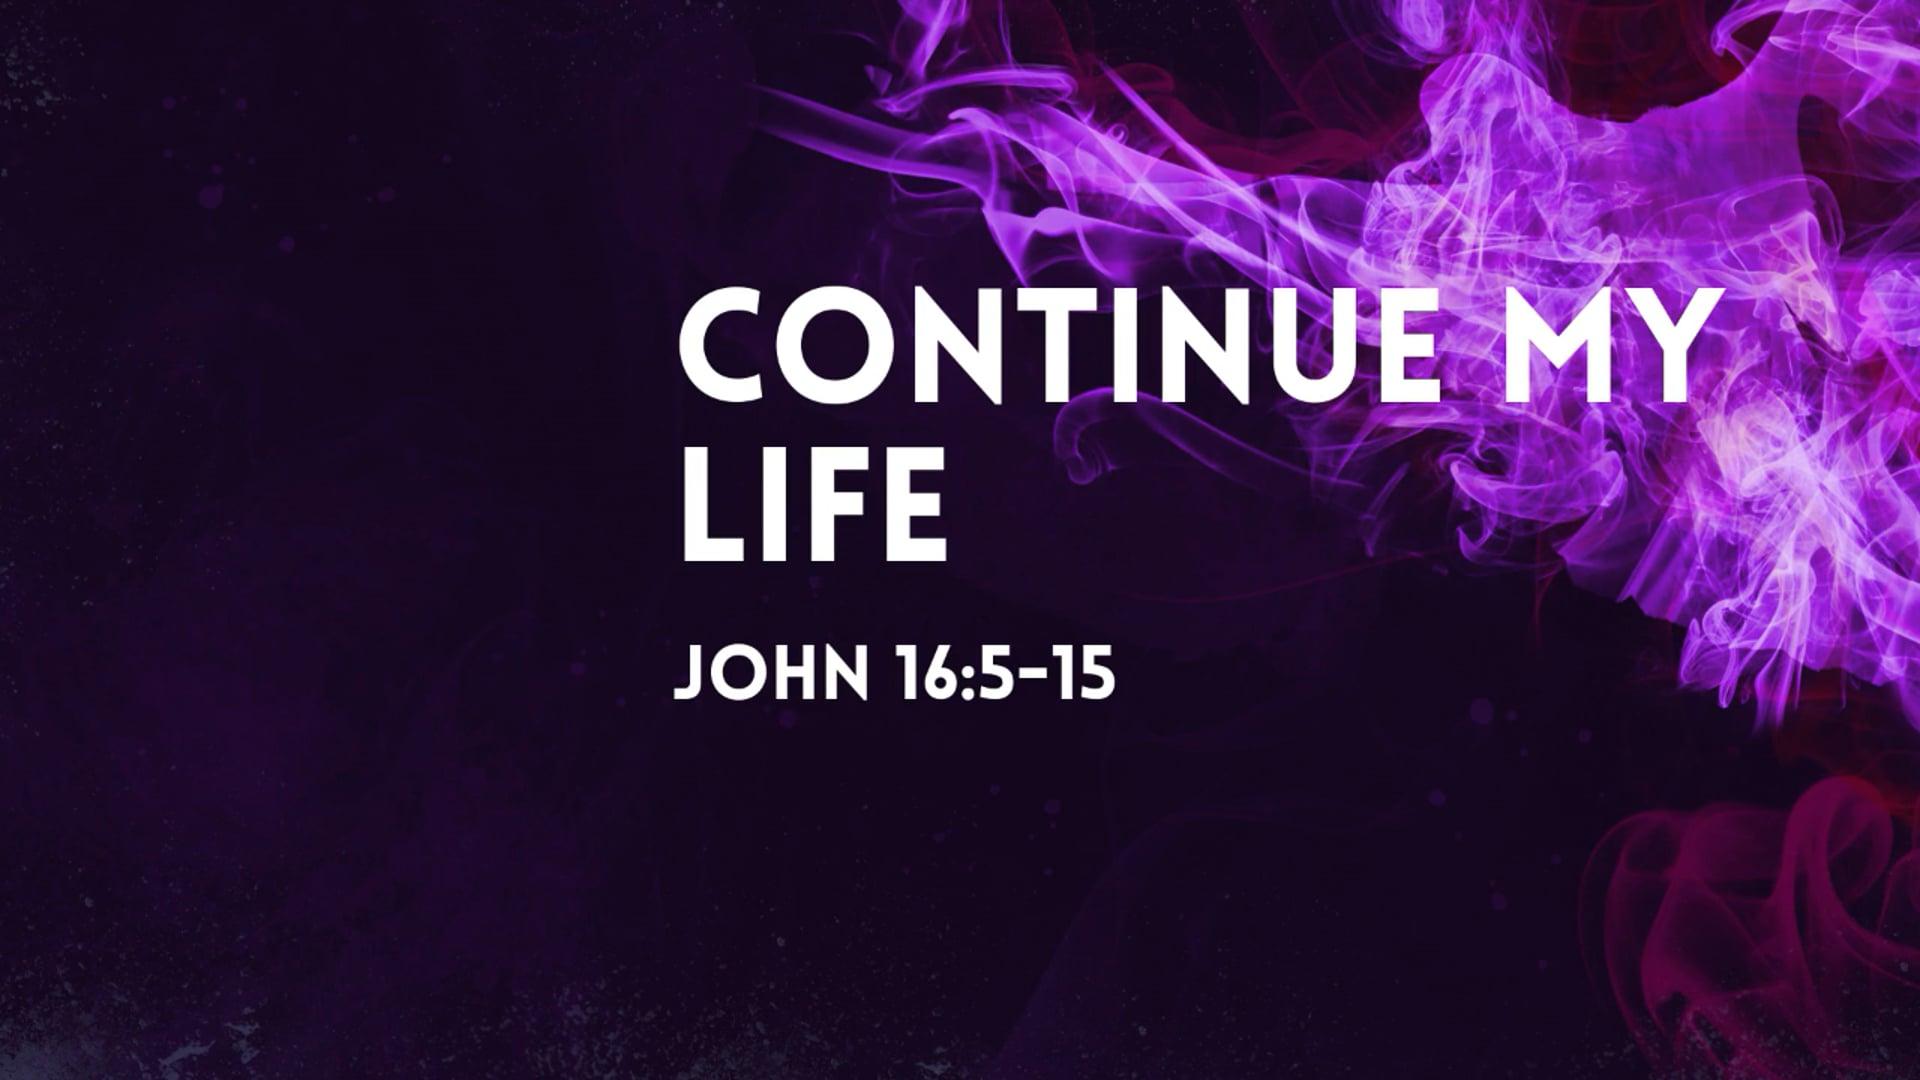 Continue My Life - John 16_5-15.mp4